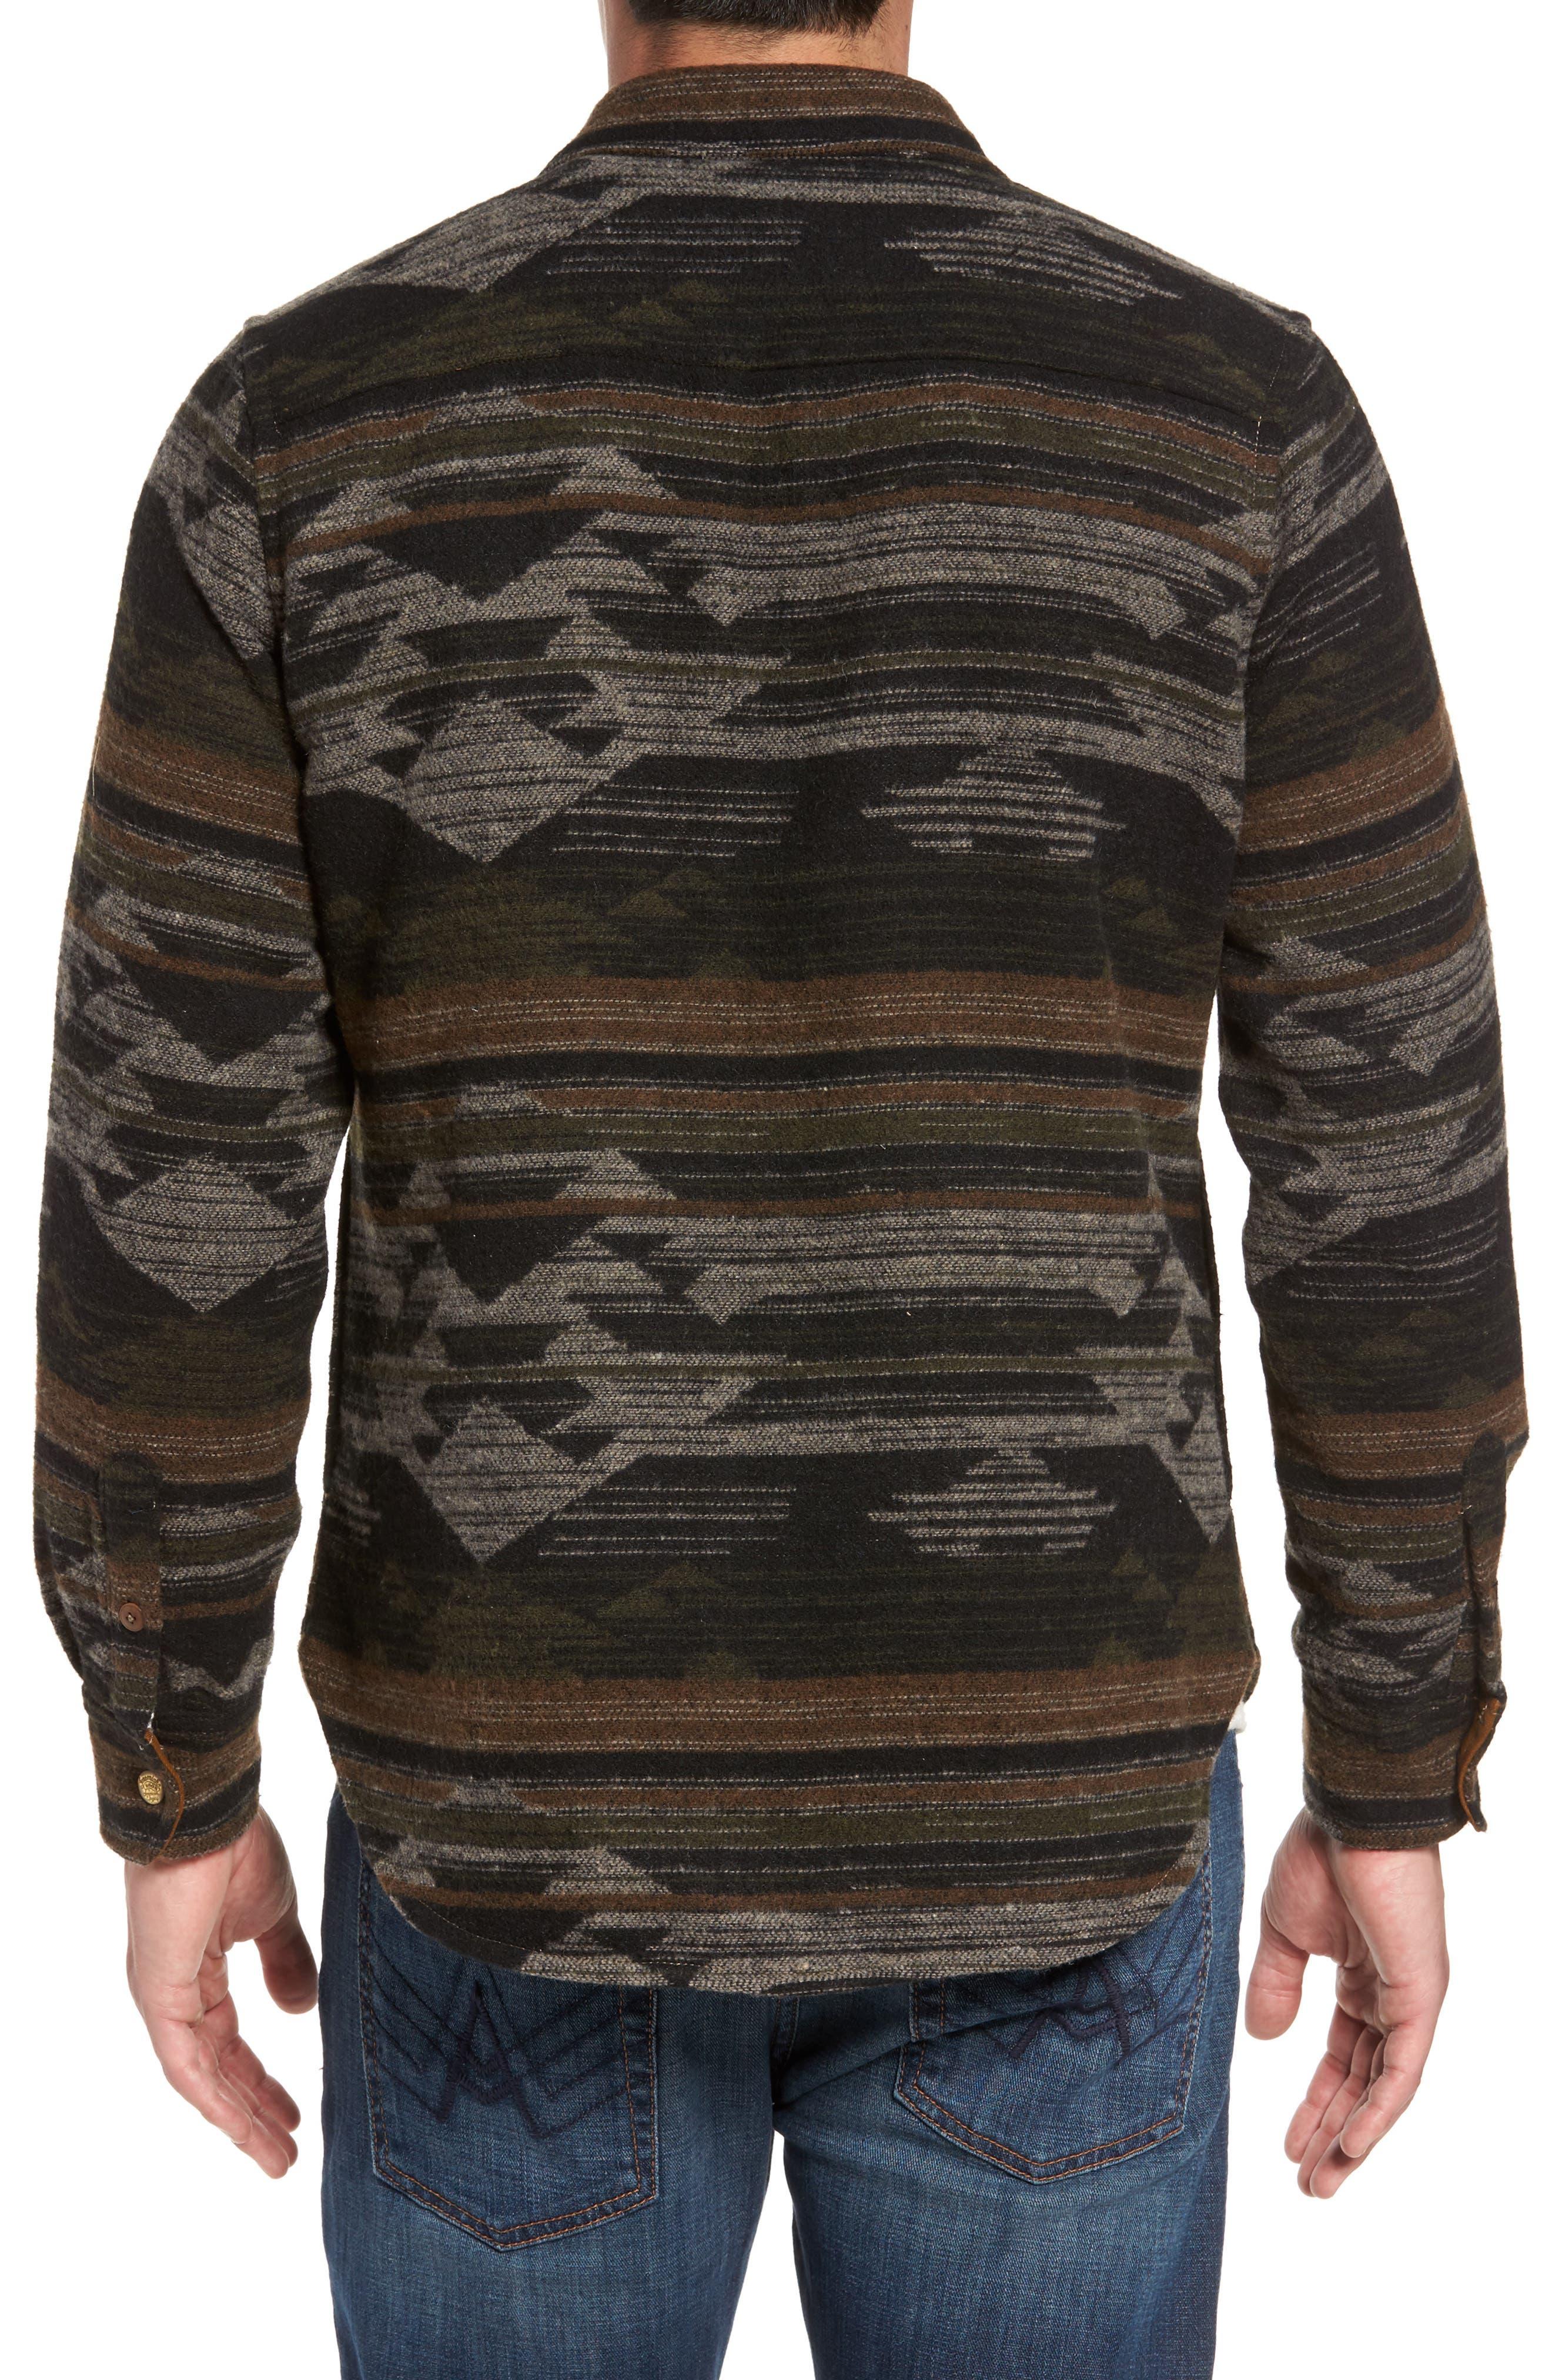 Trabuco Shirt Jacket,                             Alternate thumbnail 2, color,                             215